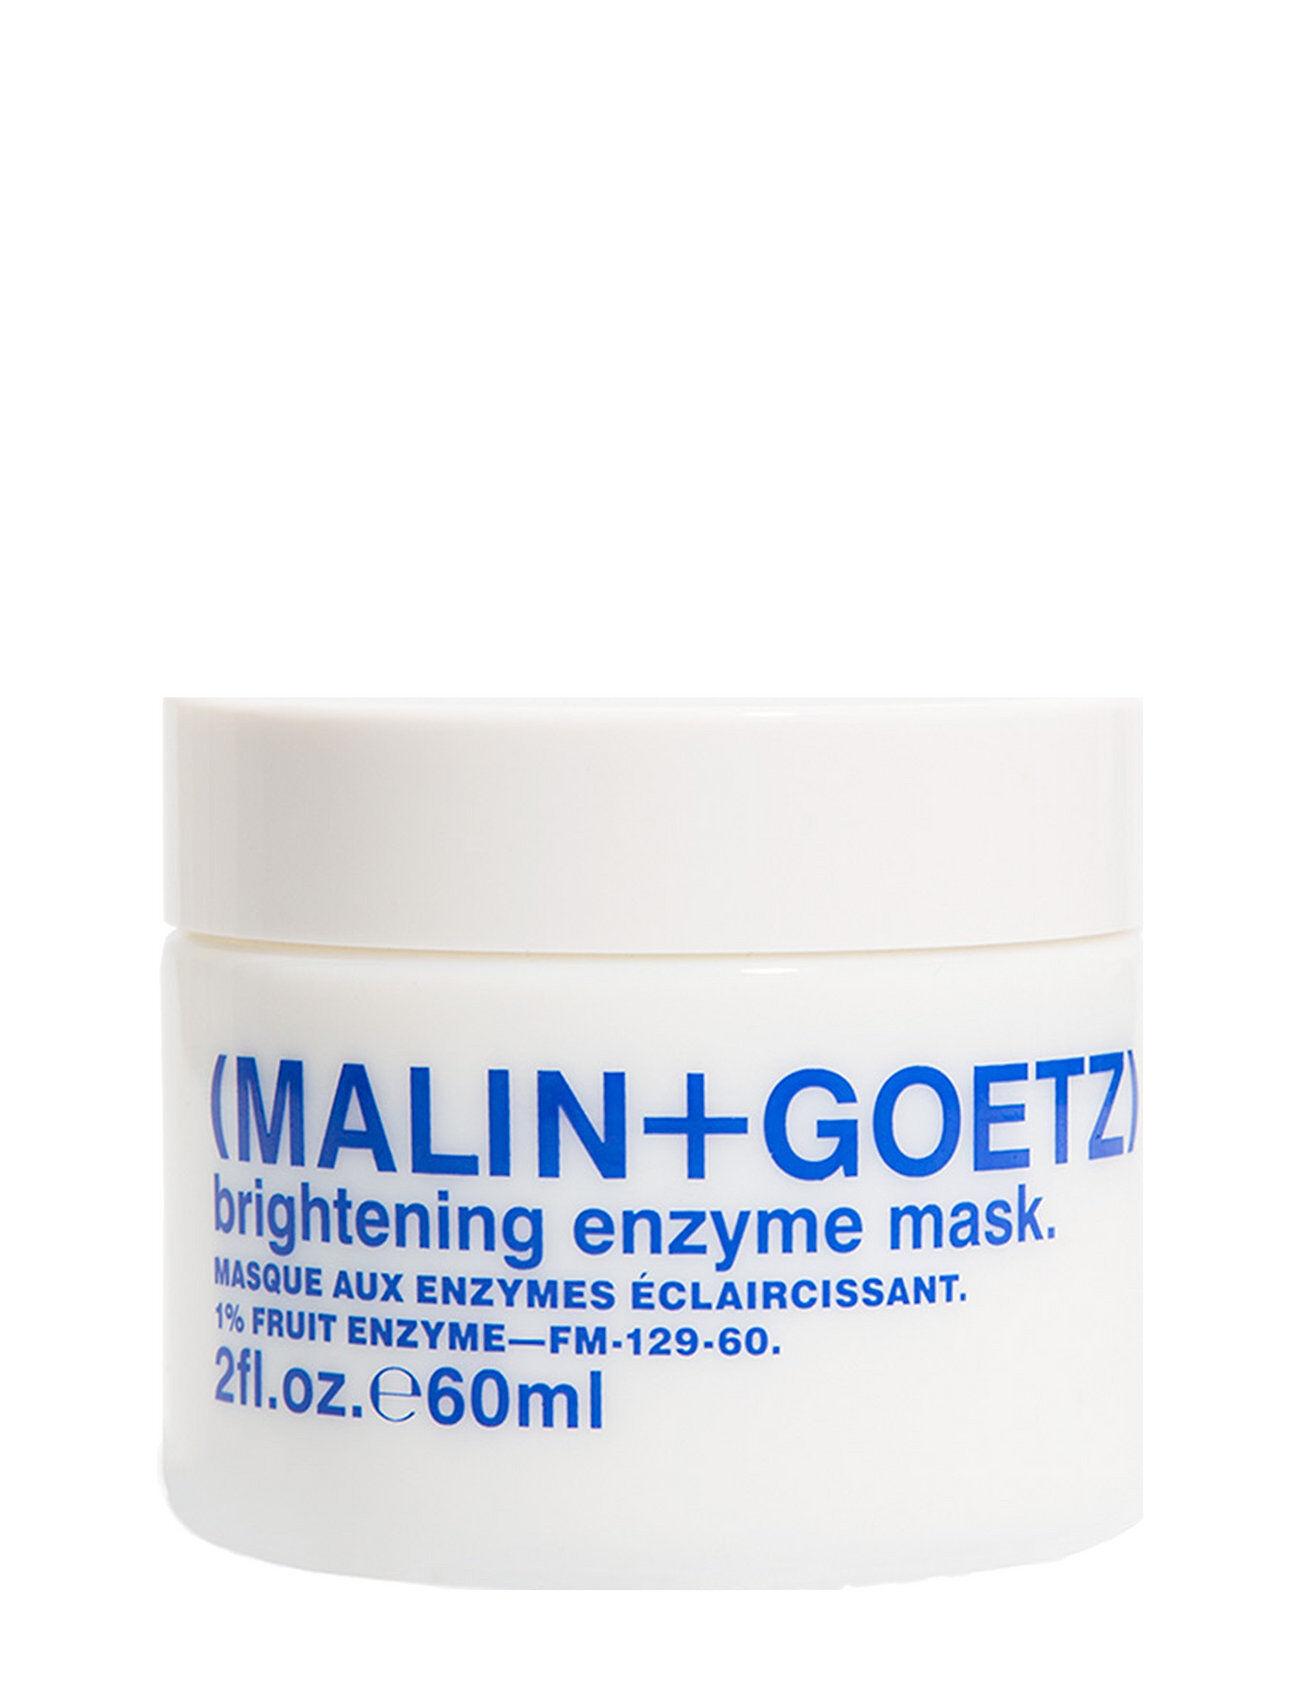 MALIN+GOETZ Brightning Enzyme Mask Kasvojen Ihonhoito Nude MALIN+GOETZ